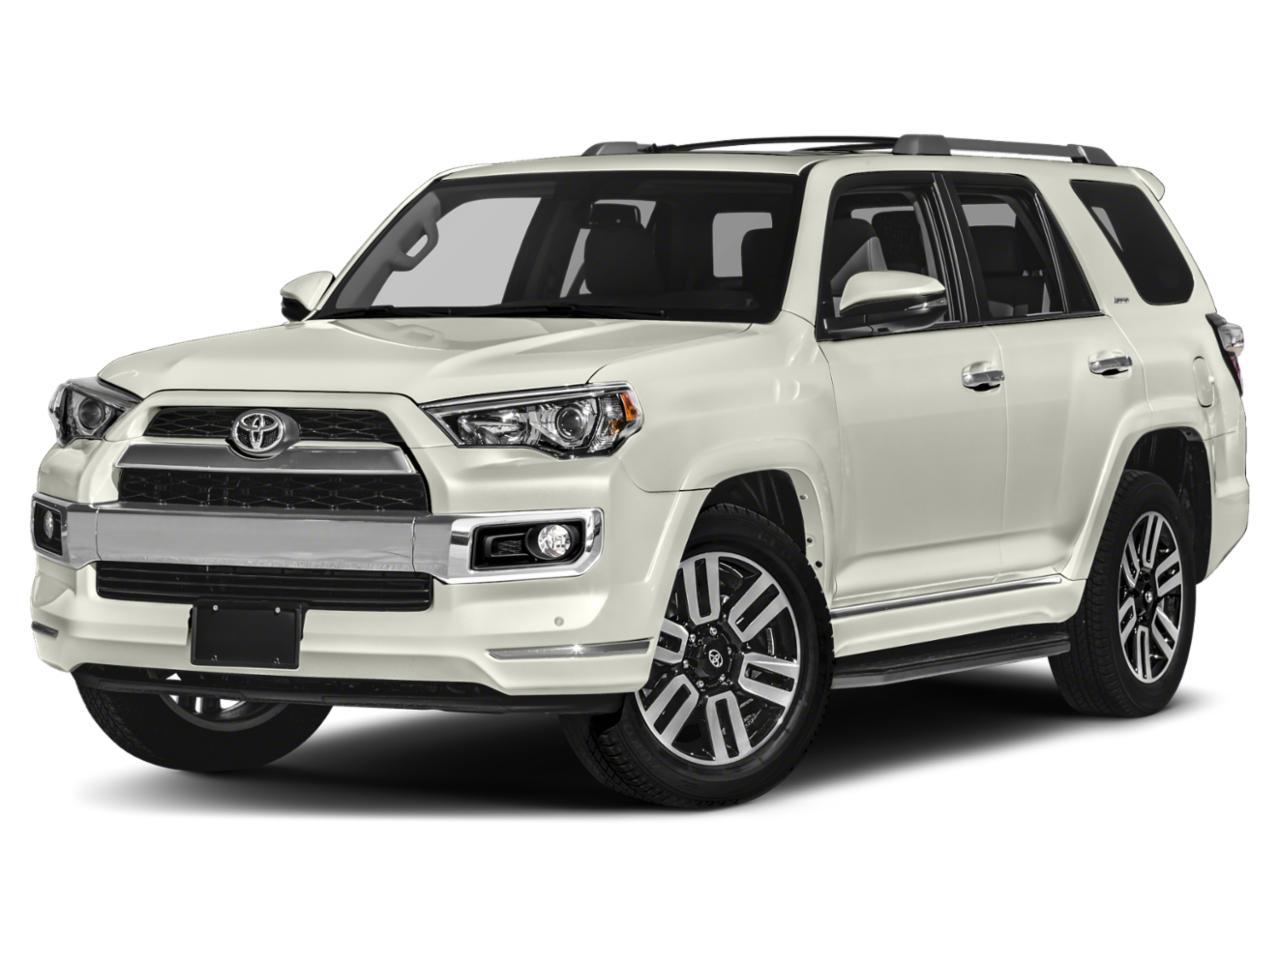 2018 Toyota 4Runner Vehicle Photo in Smyrna, GA 30080